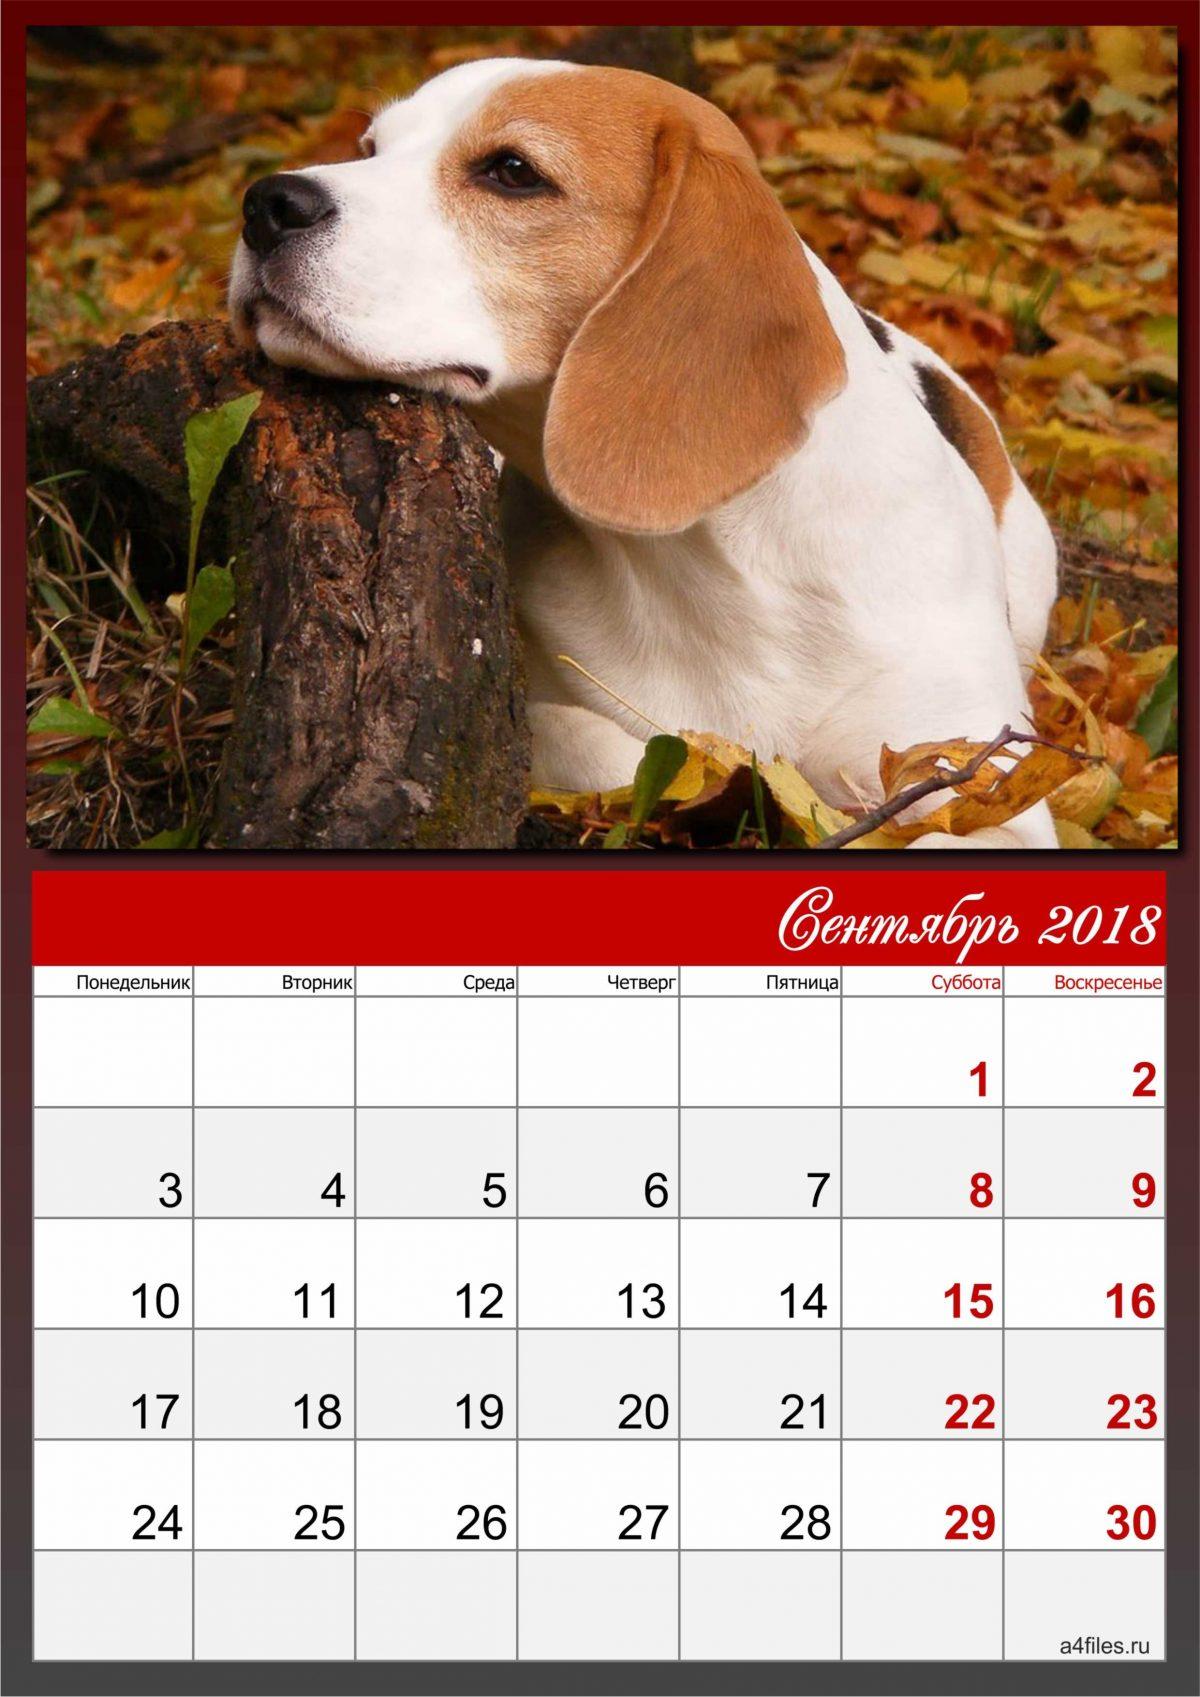 Календарь на 2018 год на сентябрь